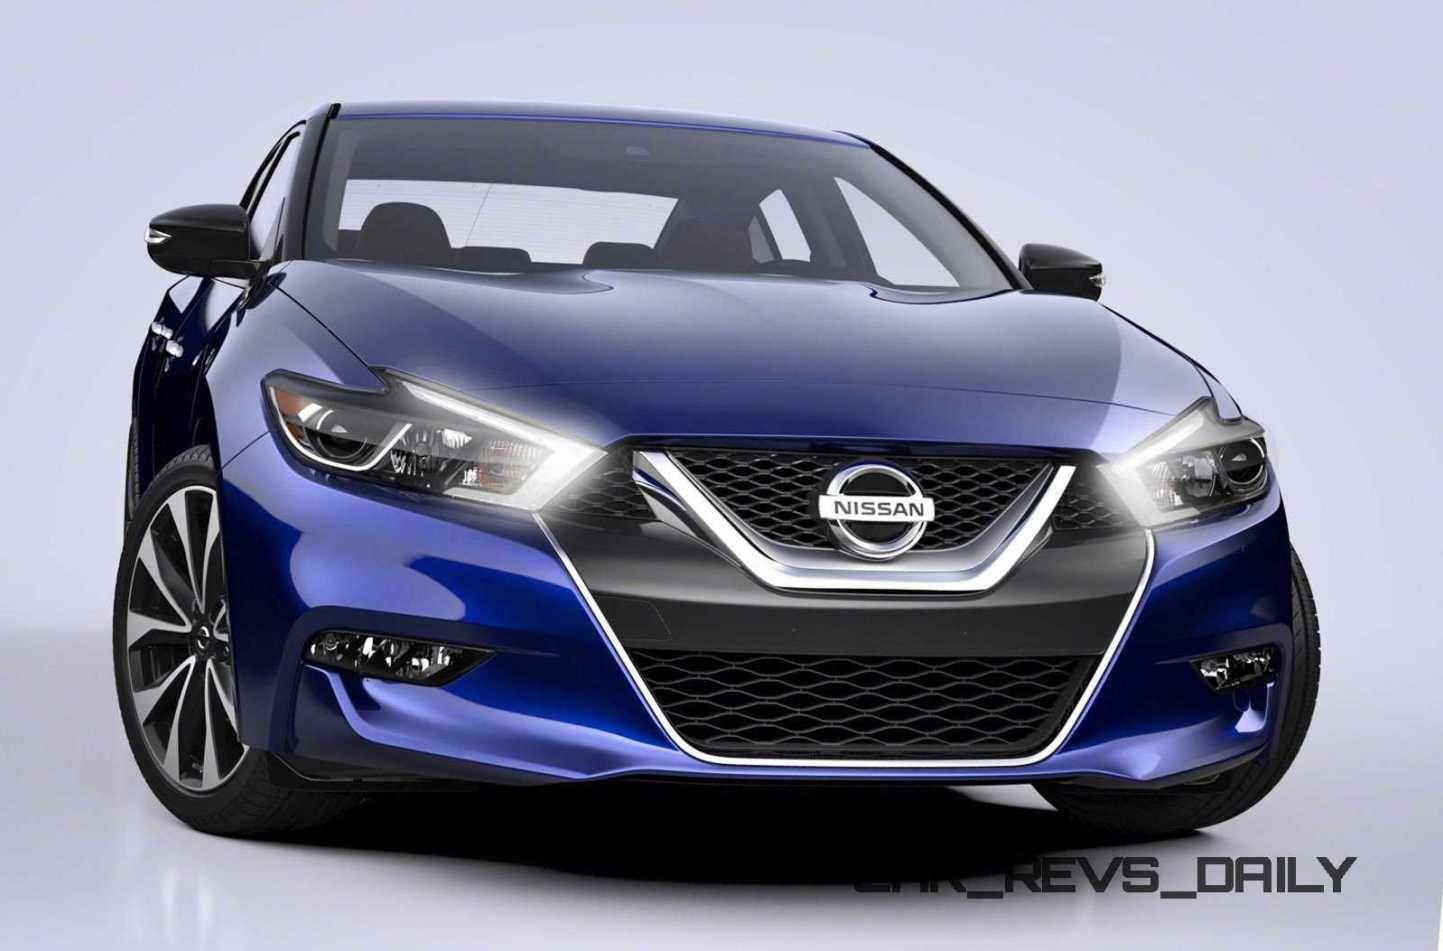 2016 nissan maxima sr deep pearl blue 11fds nissan maxima nissan and cars